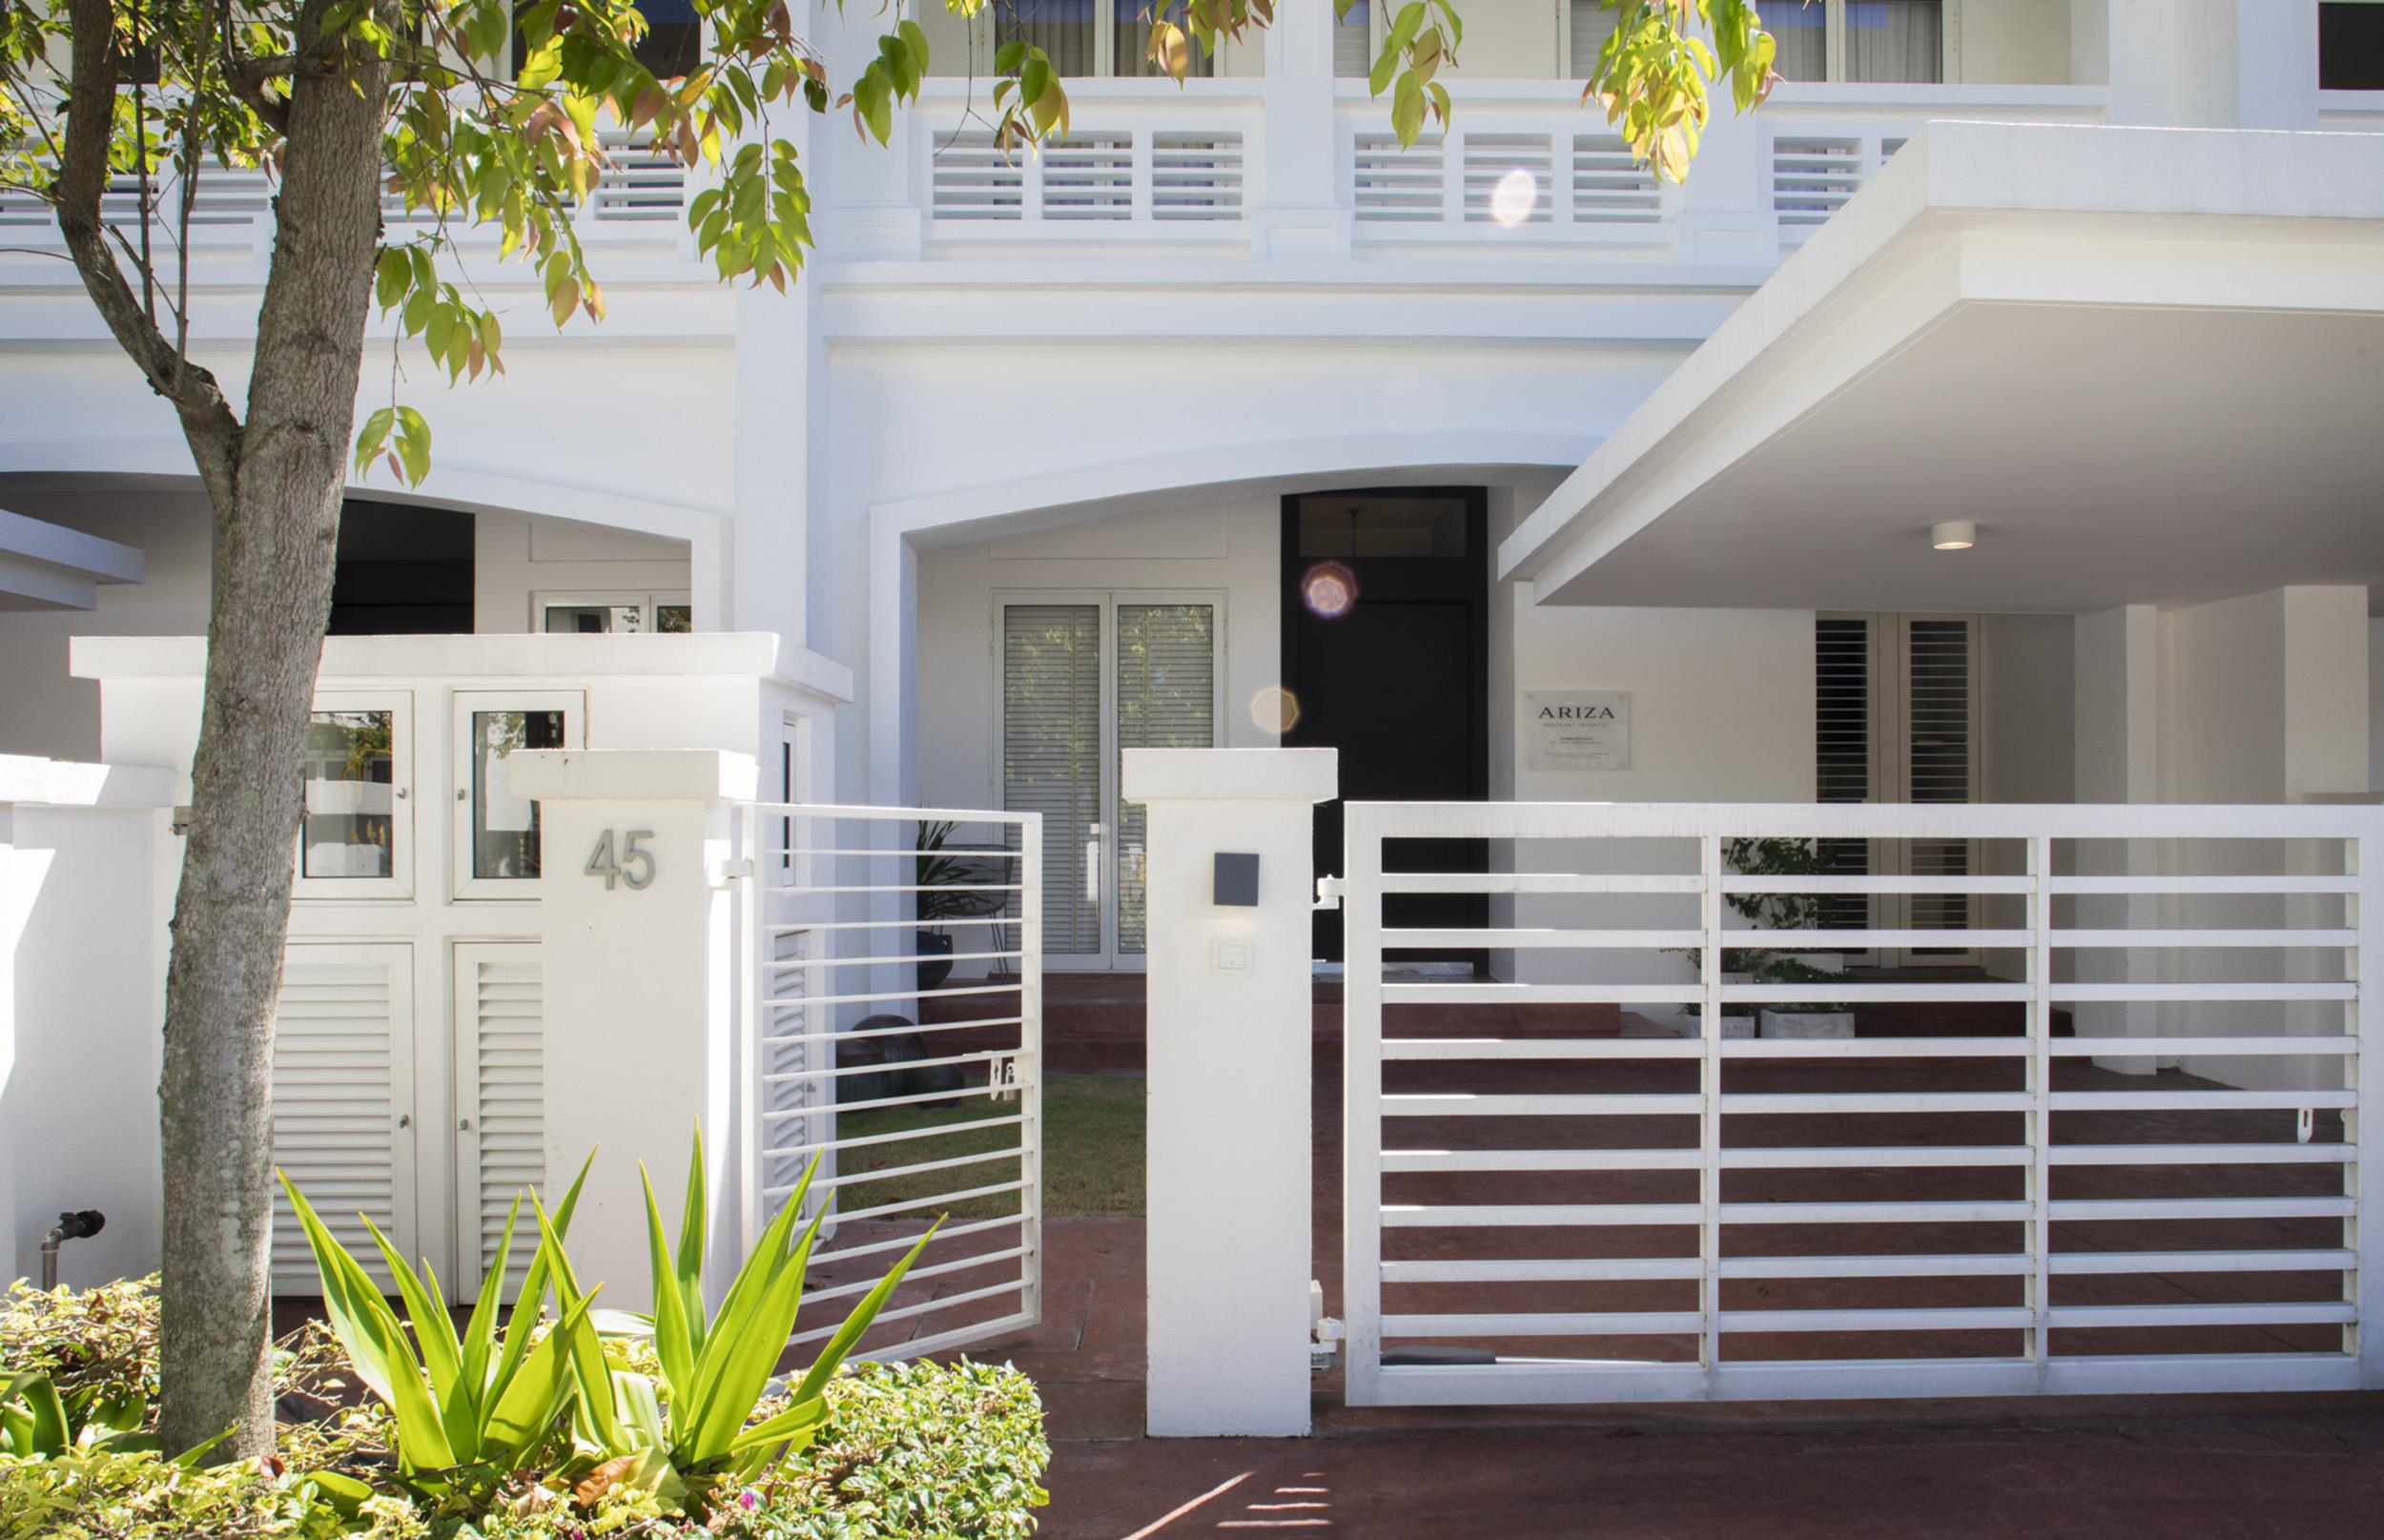 architecture_photography_sydney_australia_81.jpg